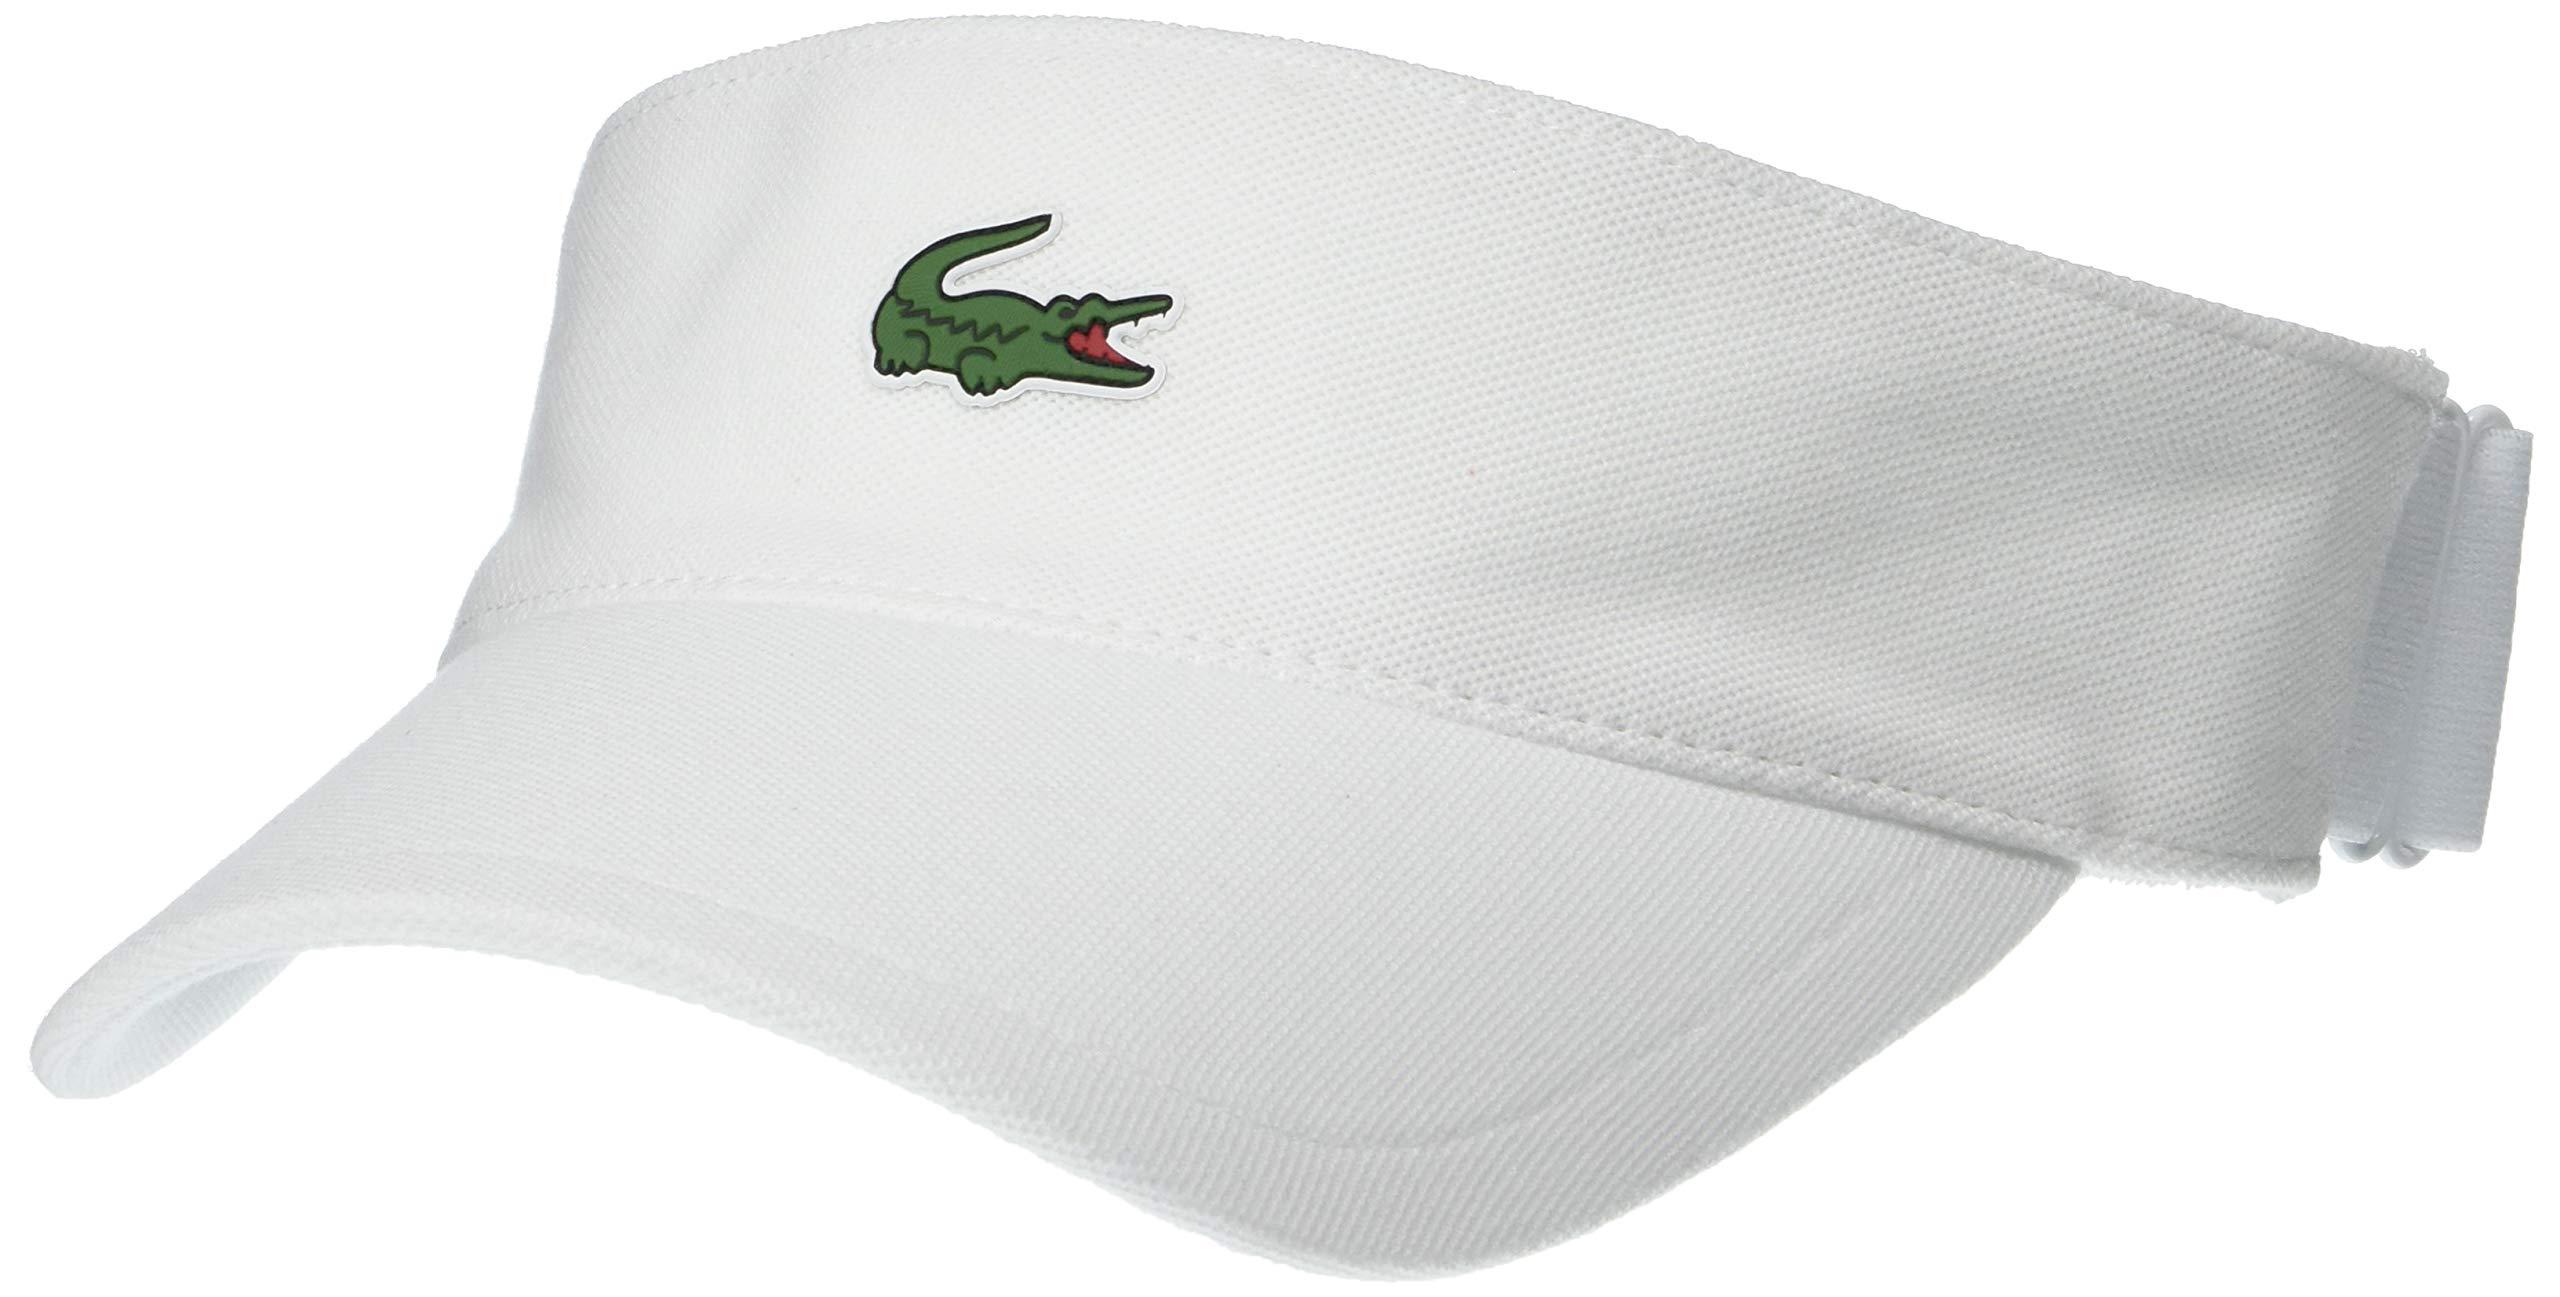 Lacoste Men's Sport Petit Pique Golf Visor, White, One Size by Lacoste